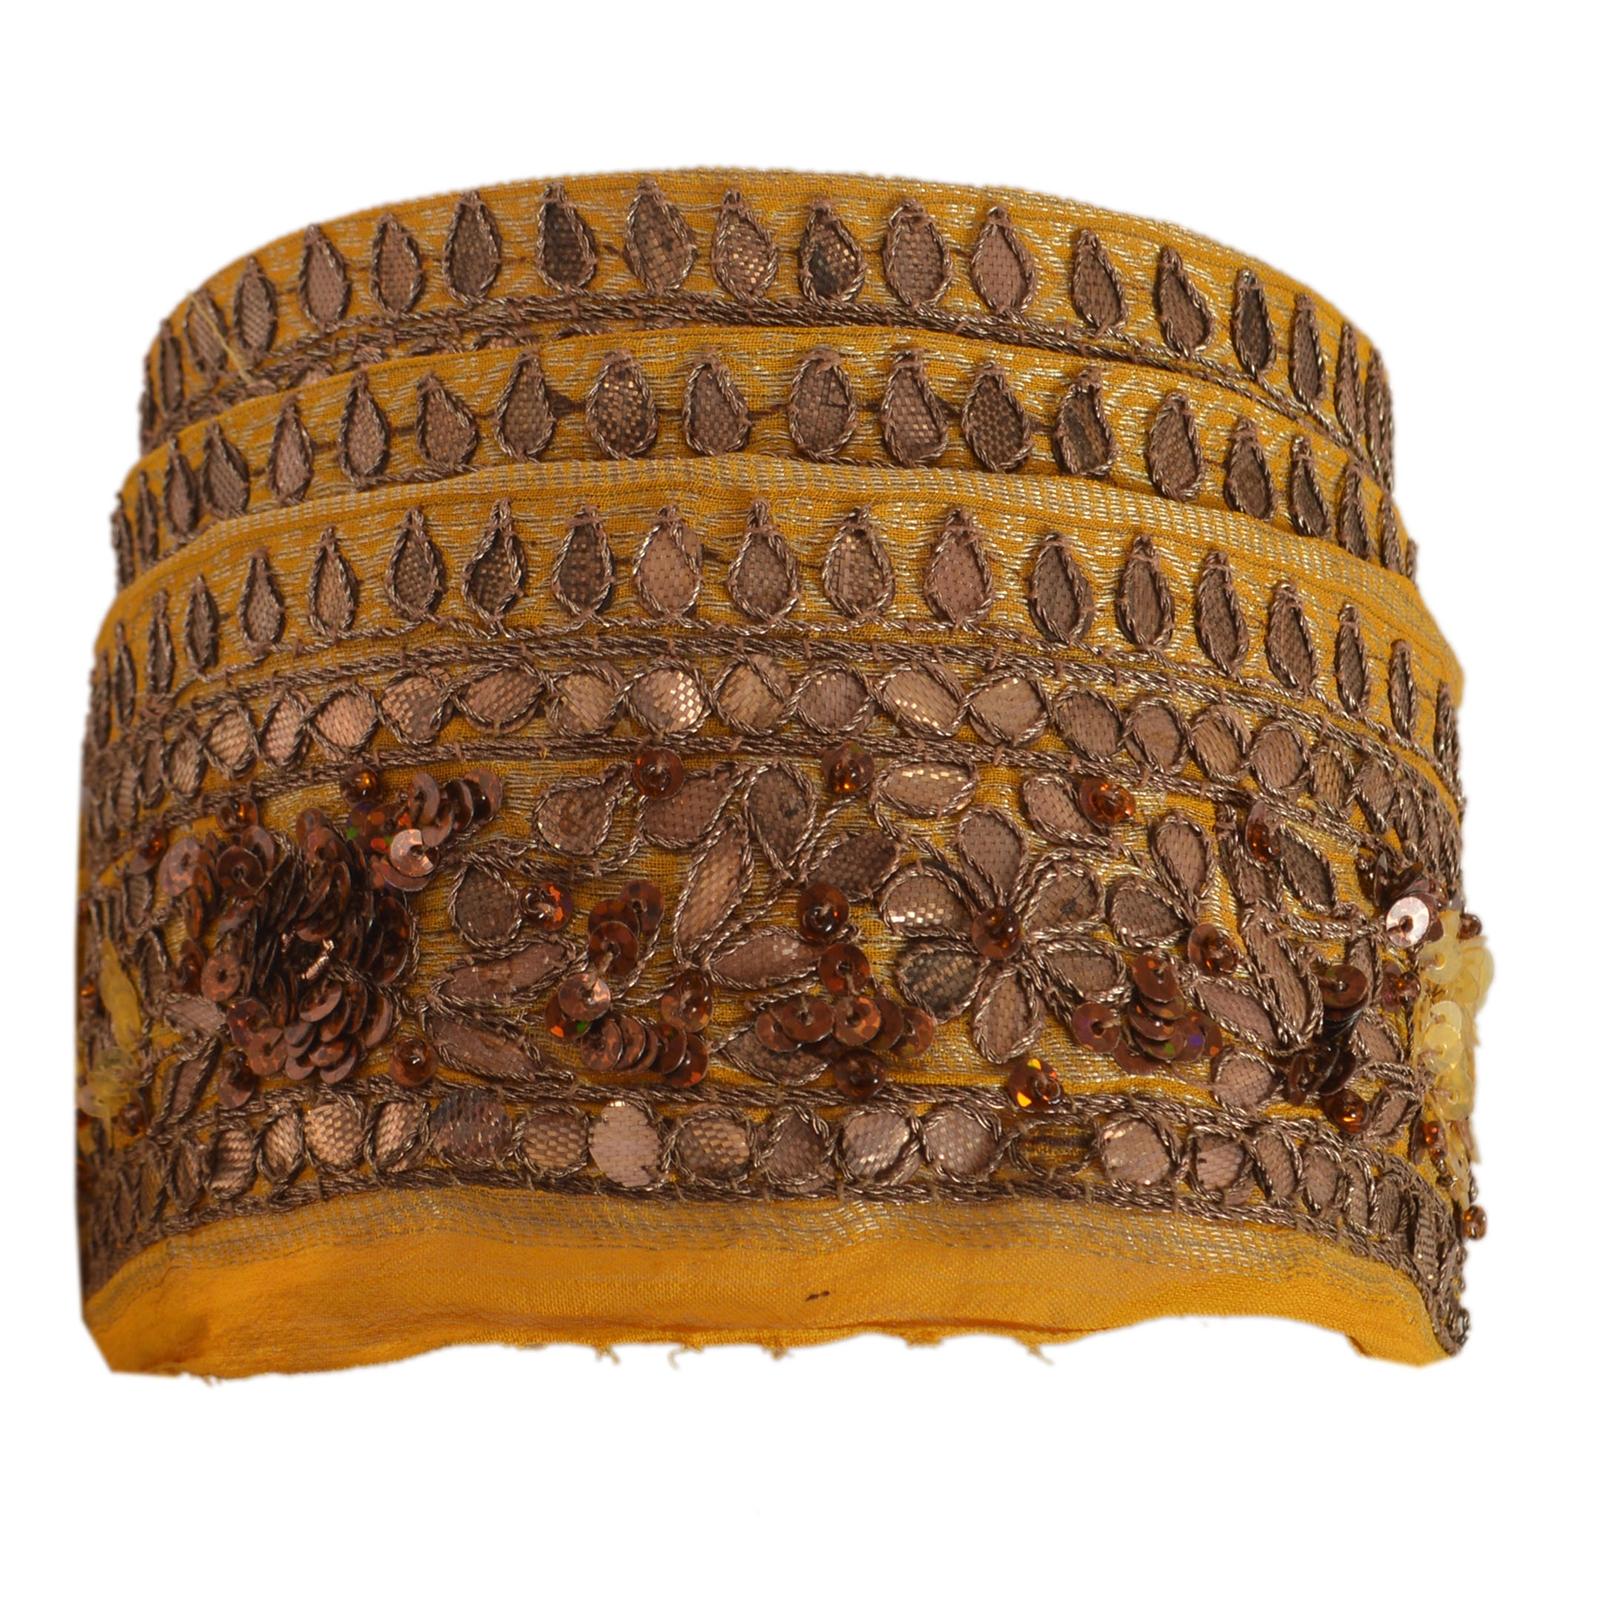 Trims Sanskriti Vintage Sari Border Craft Yellow Trim Hand Beaded Sewing Gota Lace Be Novel In Design